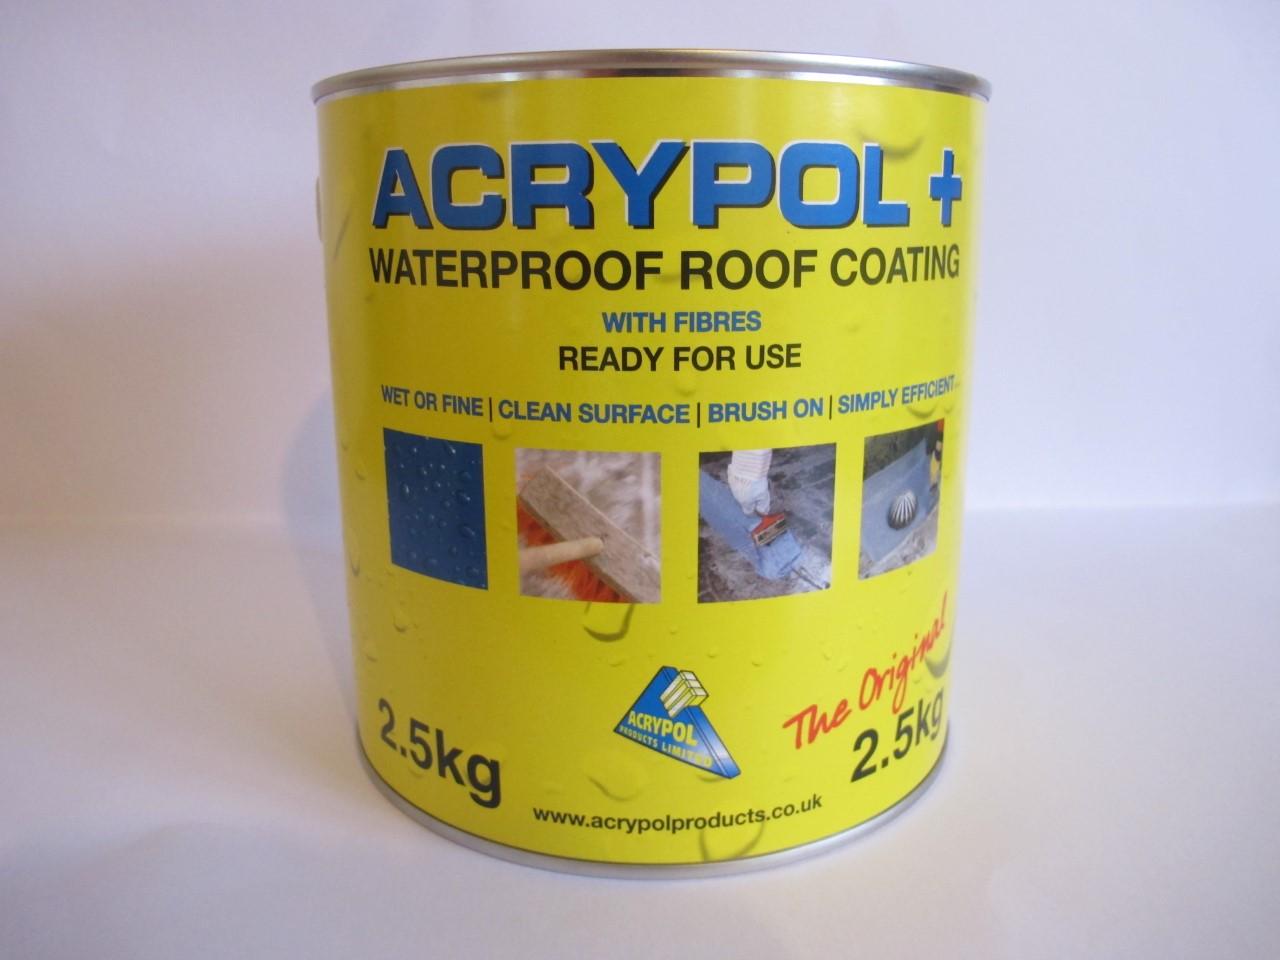 Acrypol+ now in a 2.5kg tin